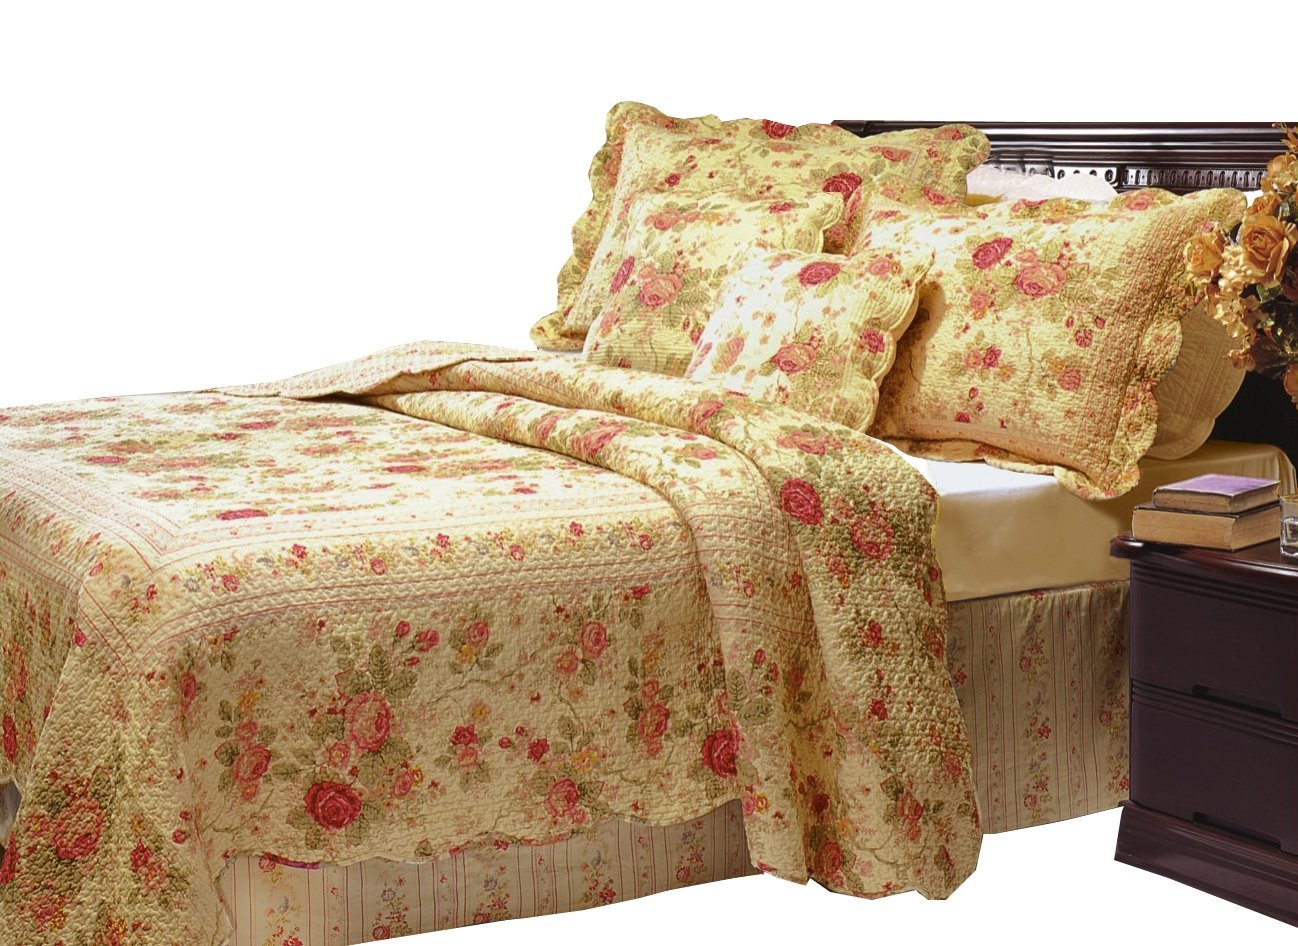 Downton abbey servants quarters bedding